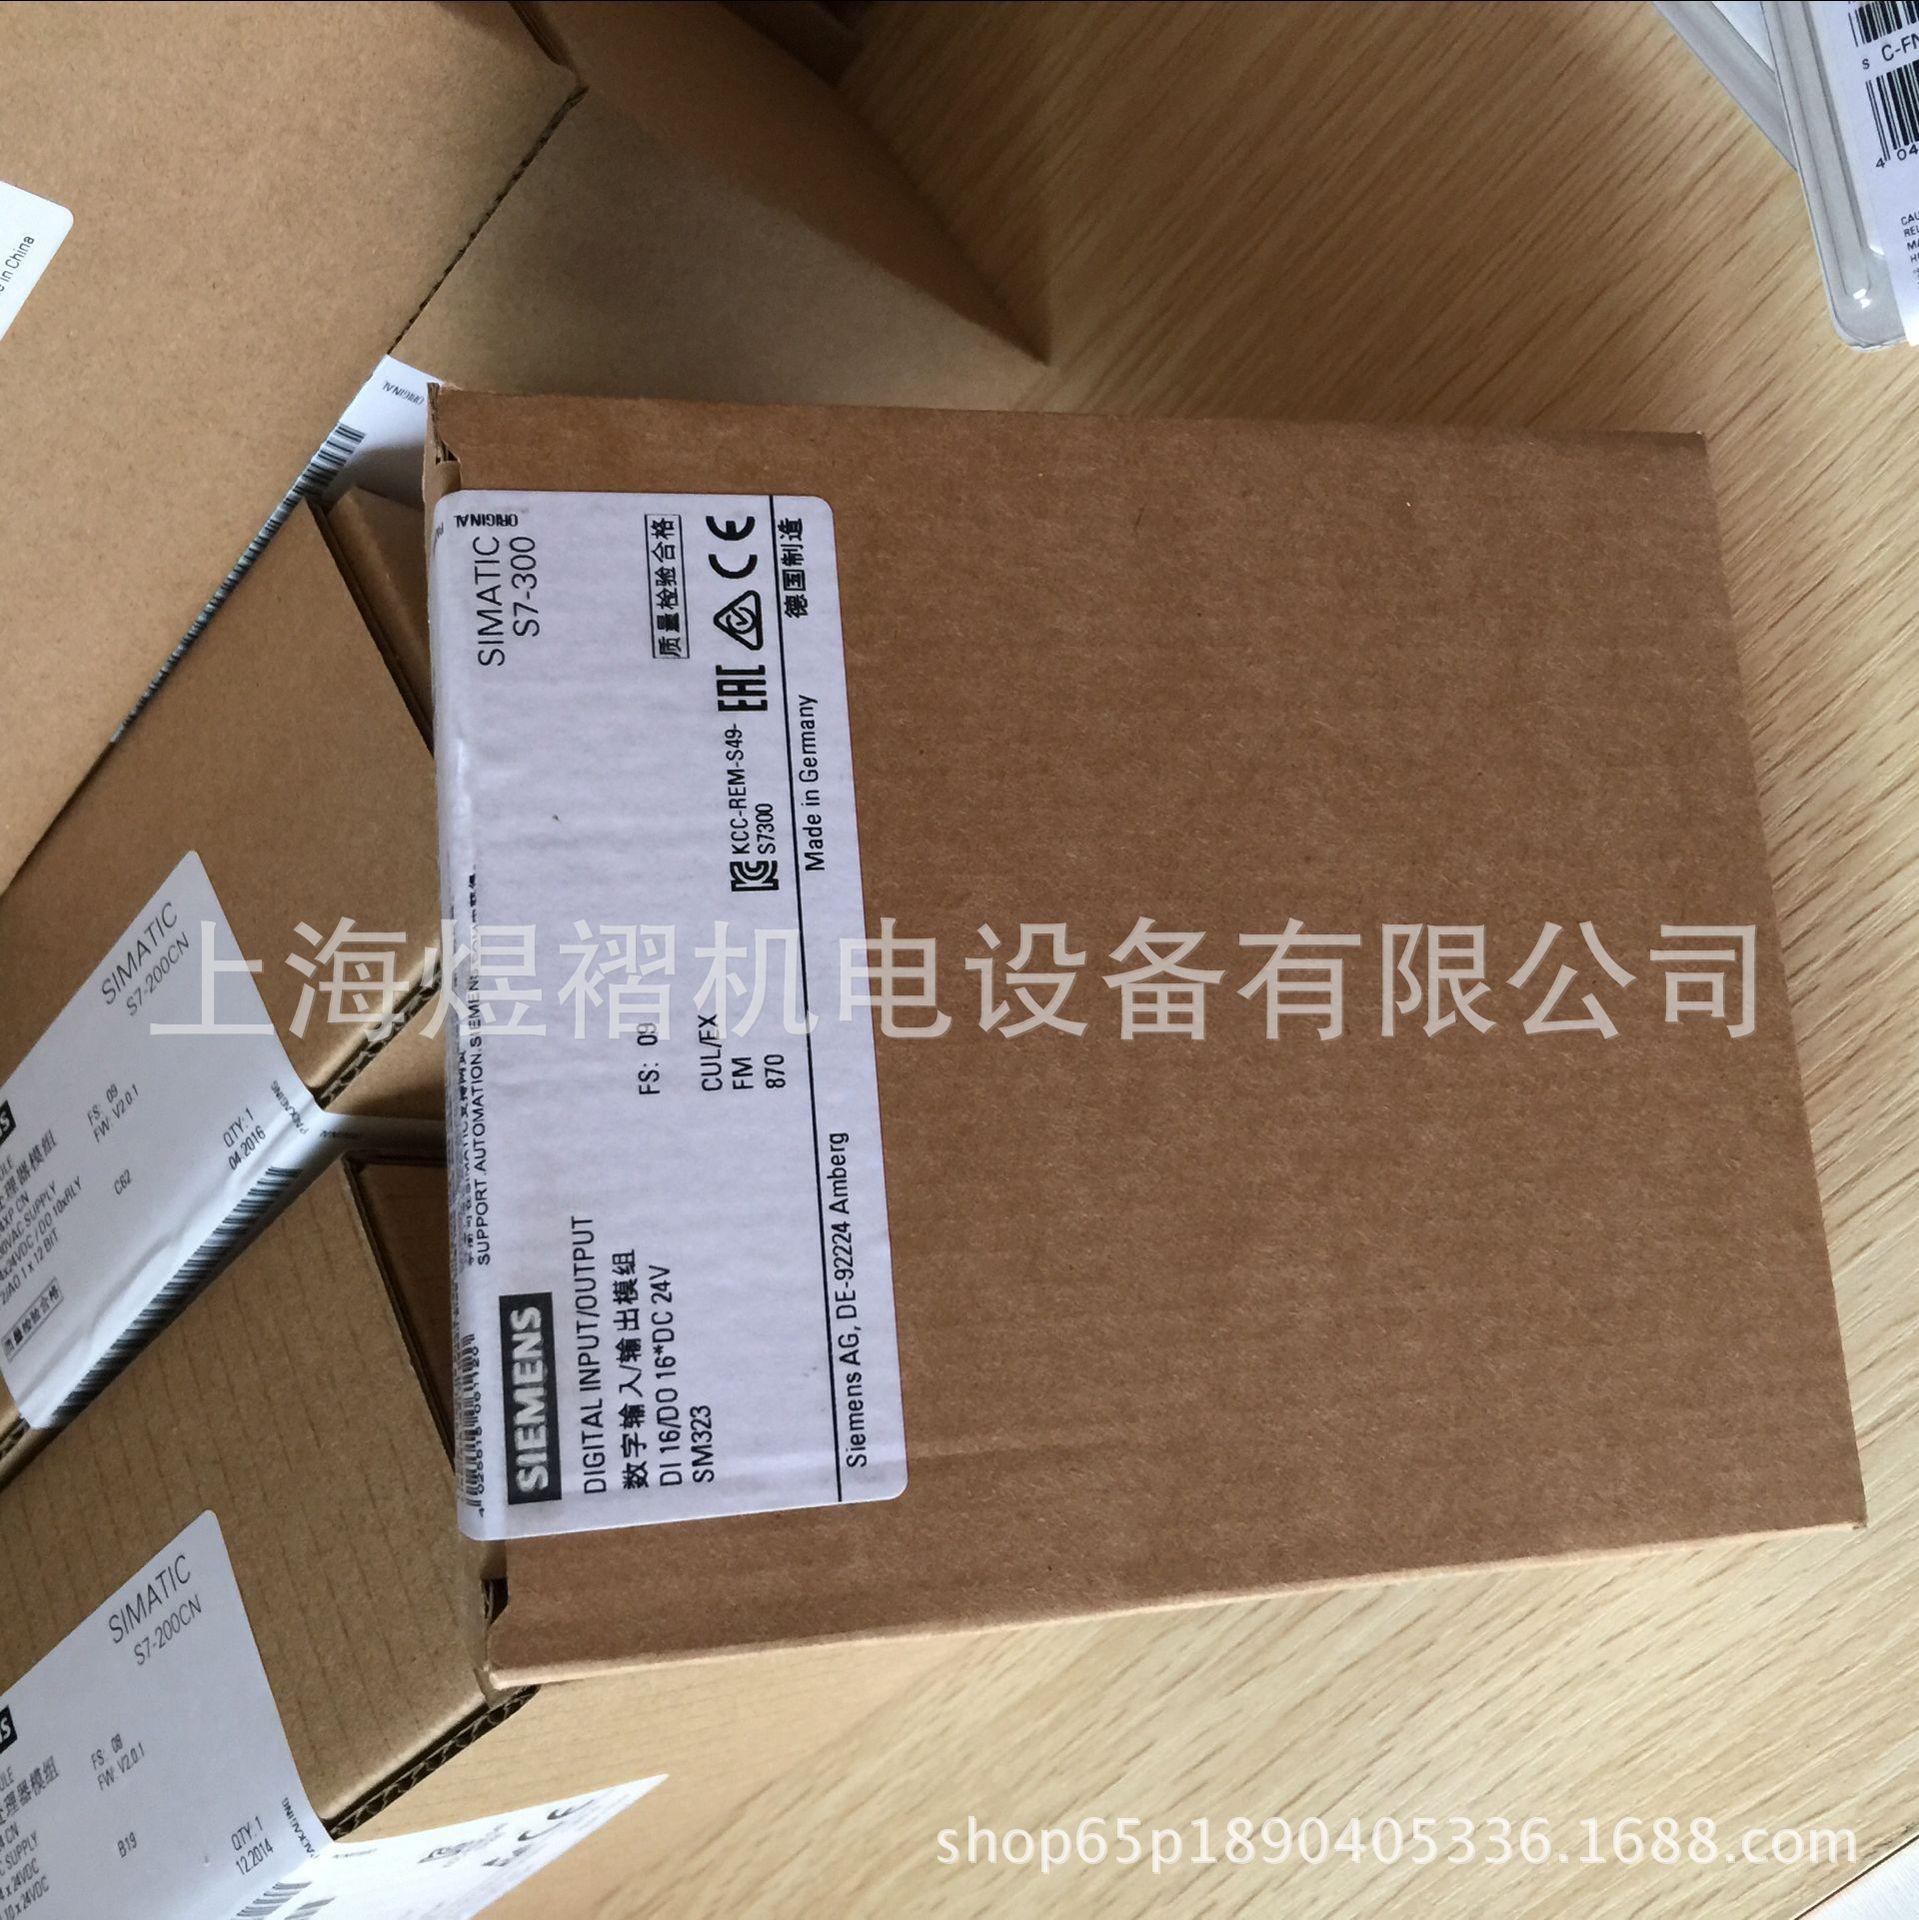 6ES7322-1BL00-4AA1西门子PLC/S7-300数字量输出模块SM322